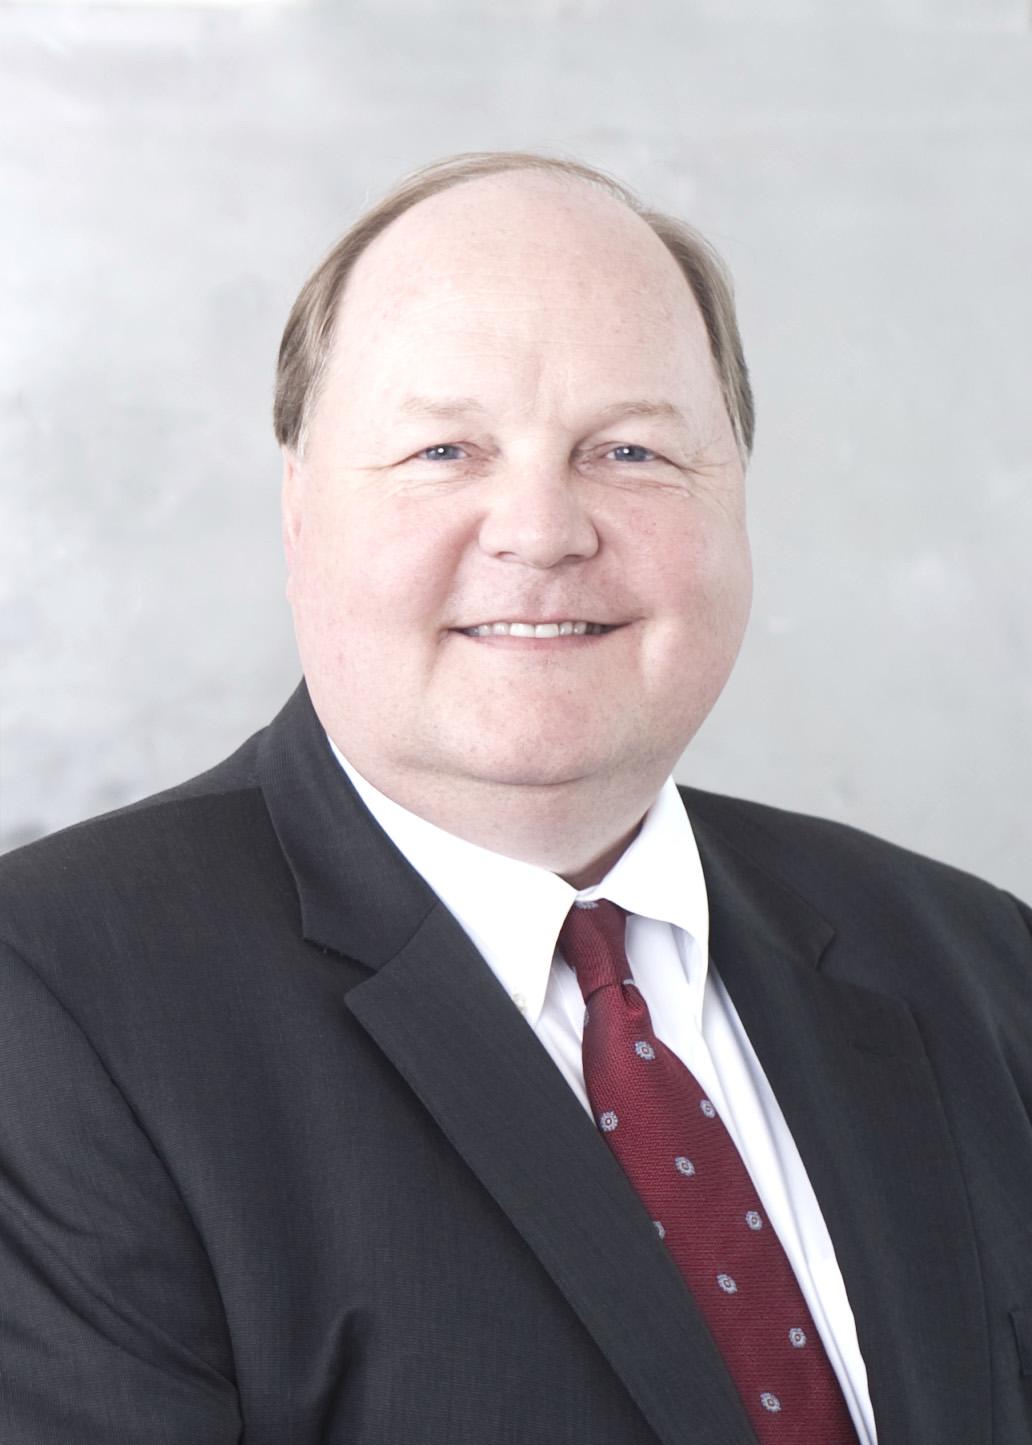 Daniel D. Sparks